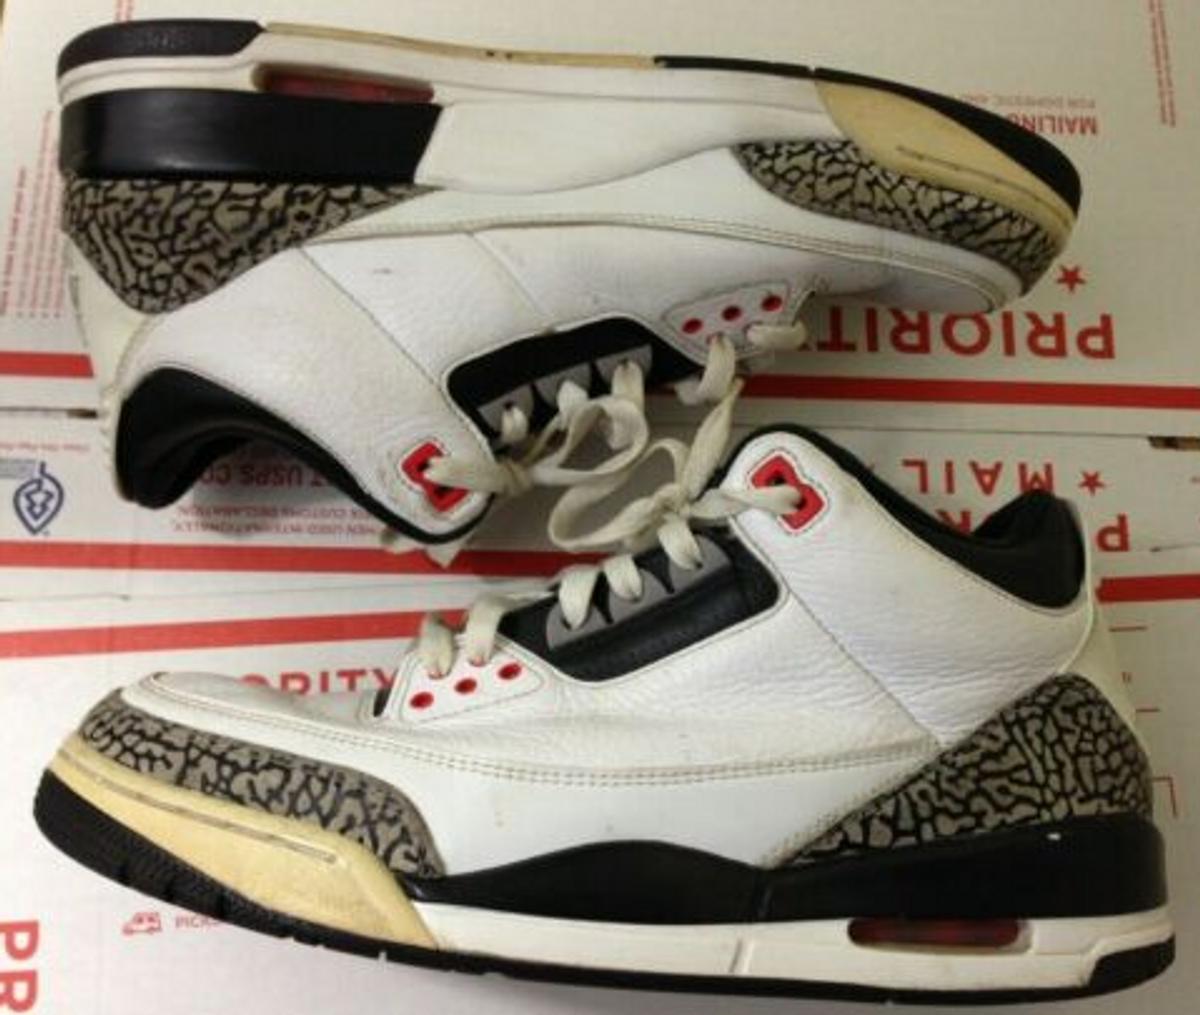 newest 3a65d 50e77 Nike × Jordan Brand ×. Nike Air Jordan 3 III Retro Infrared 23 White Black  Cement ...